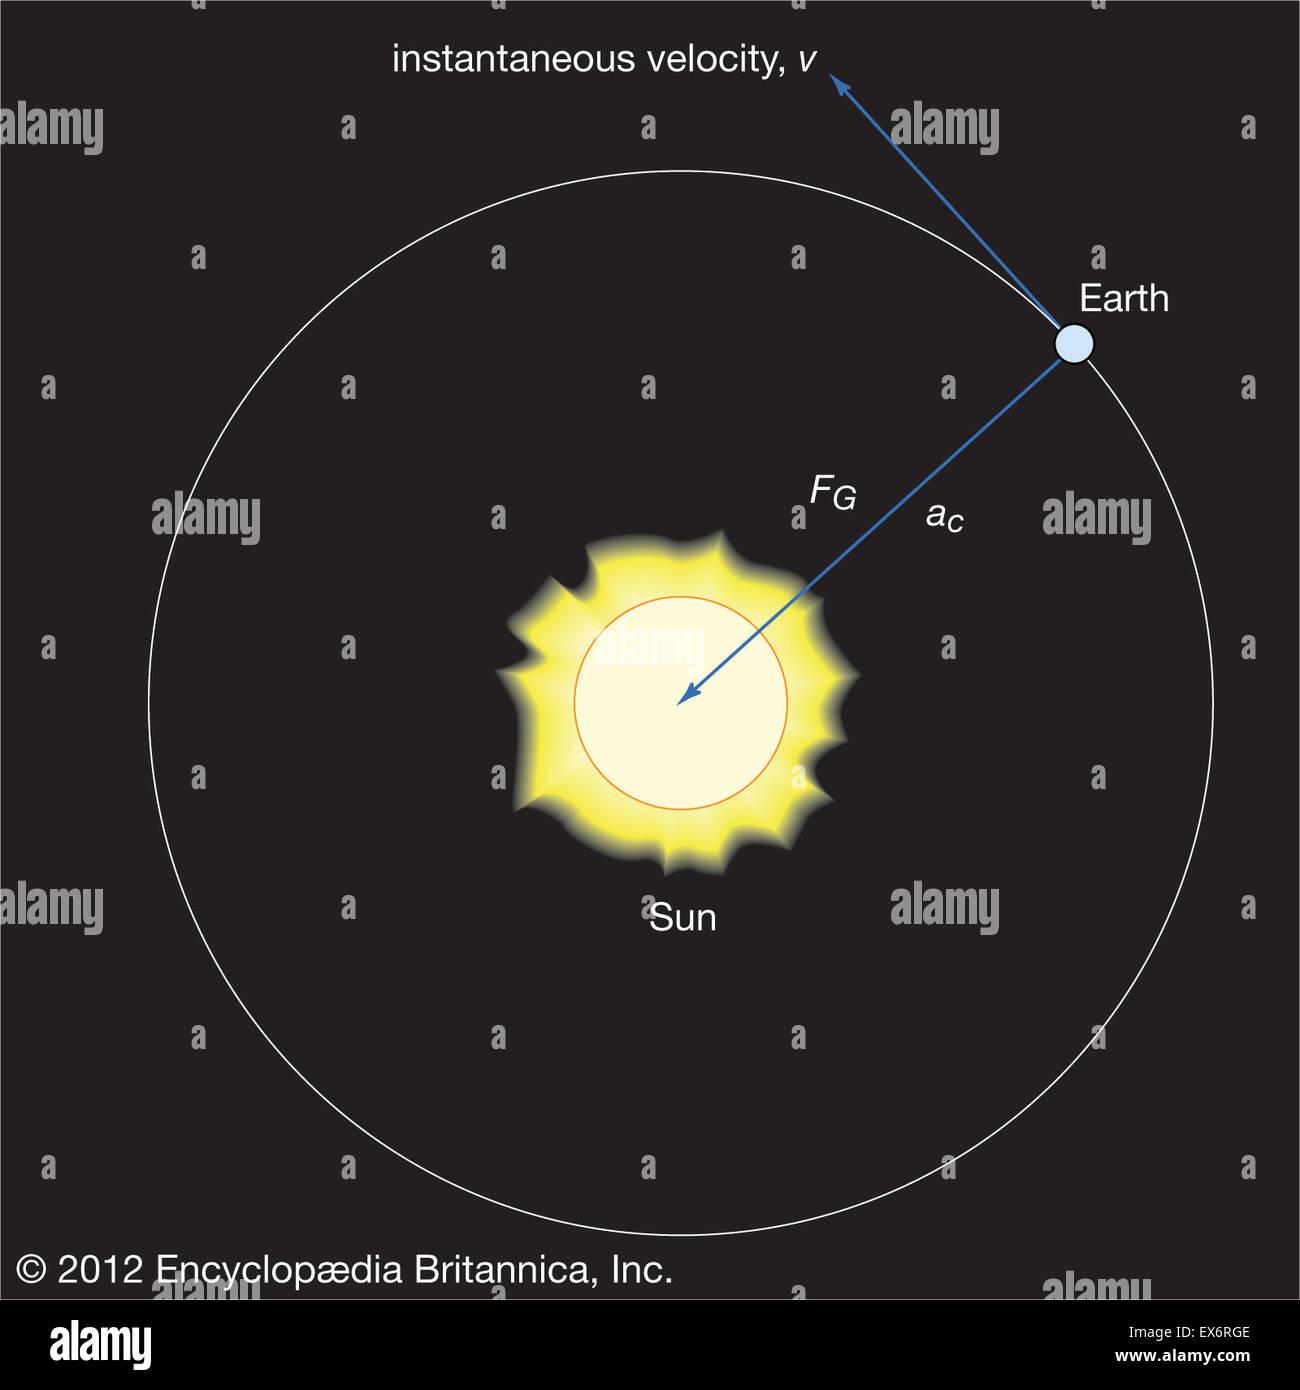 Centripetal acceleration: Earth's orbital motion - Stock Image